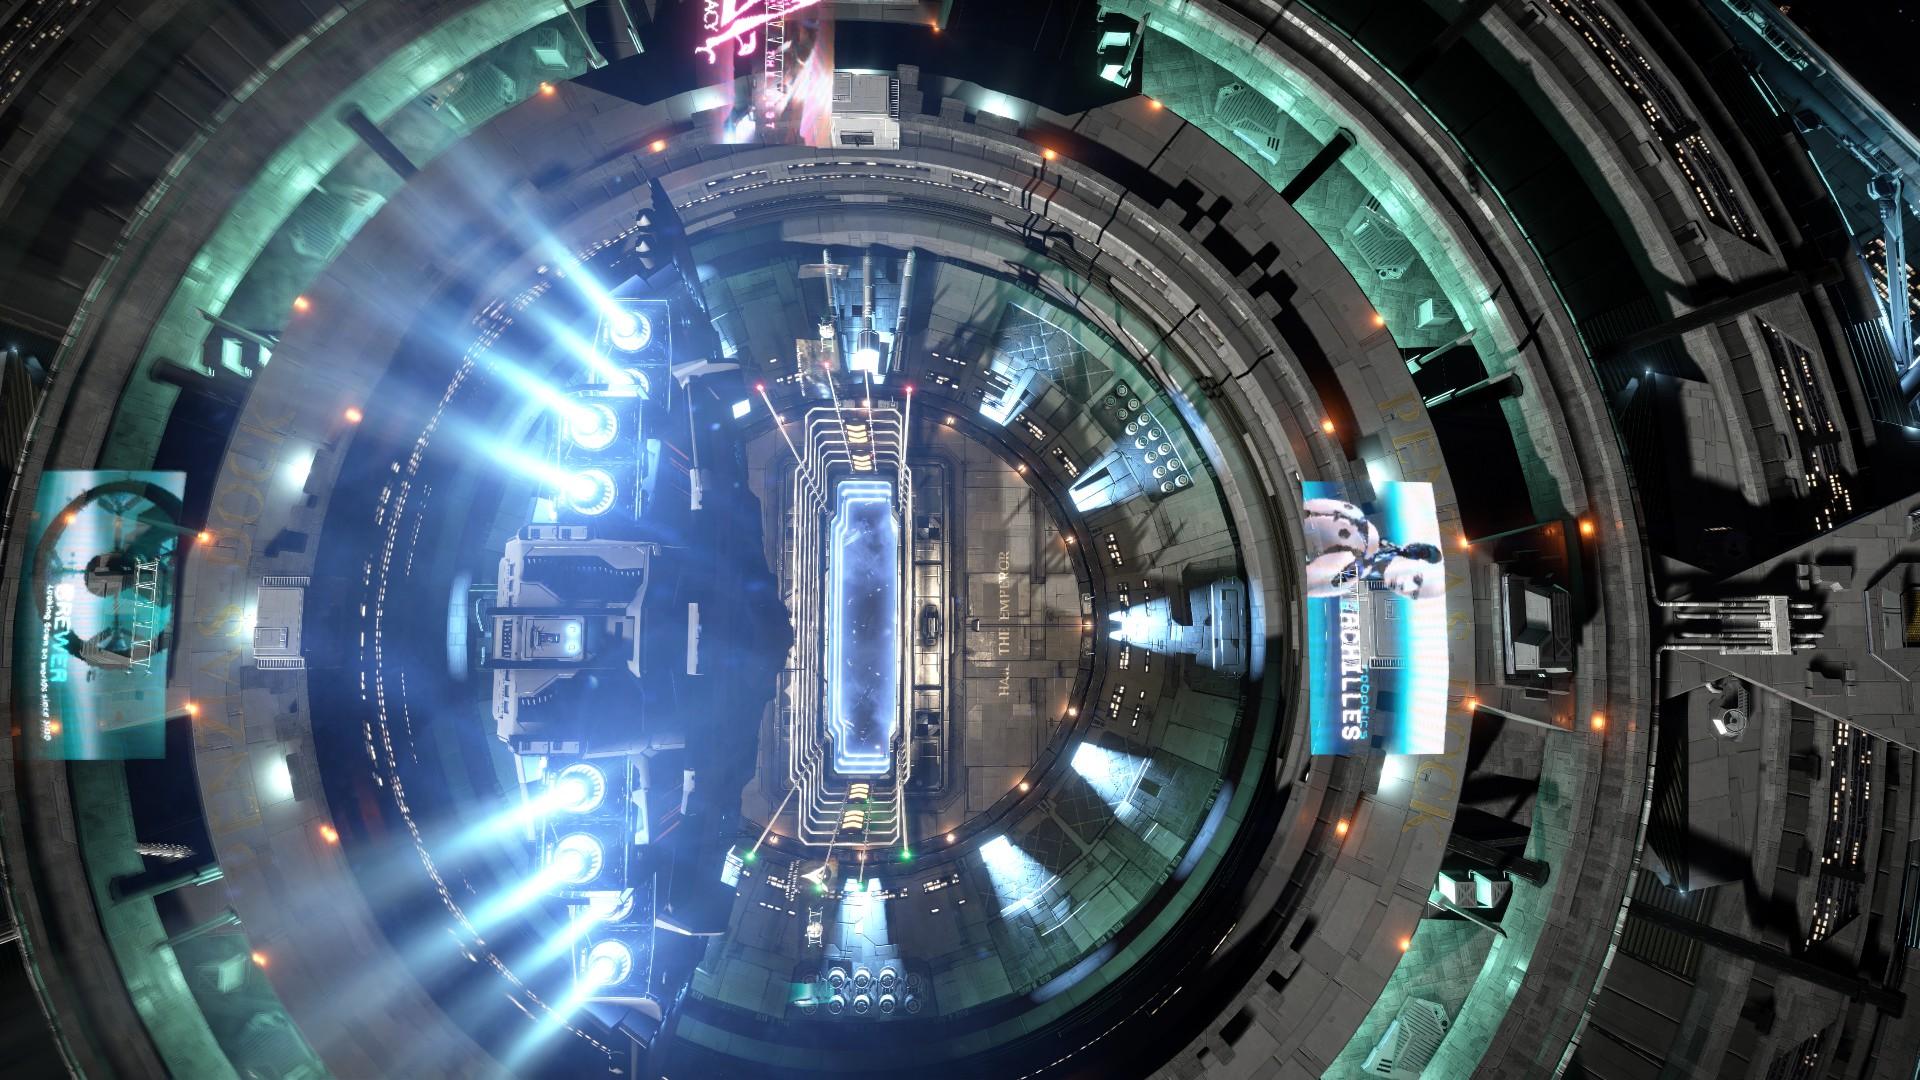 General 1920x1080 Elite: Dangerous space Space Simulator Type-10 space station Starport Coriolis Station spaceship